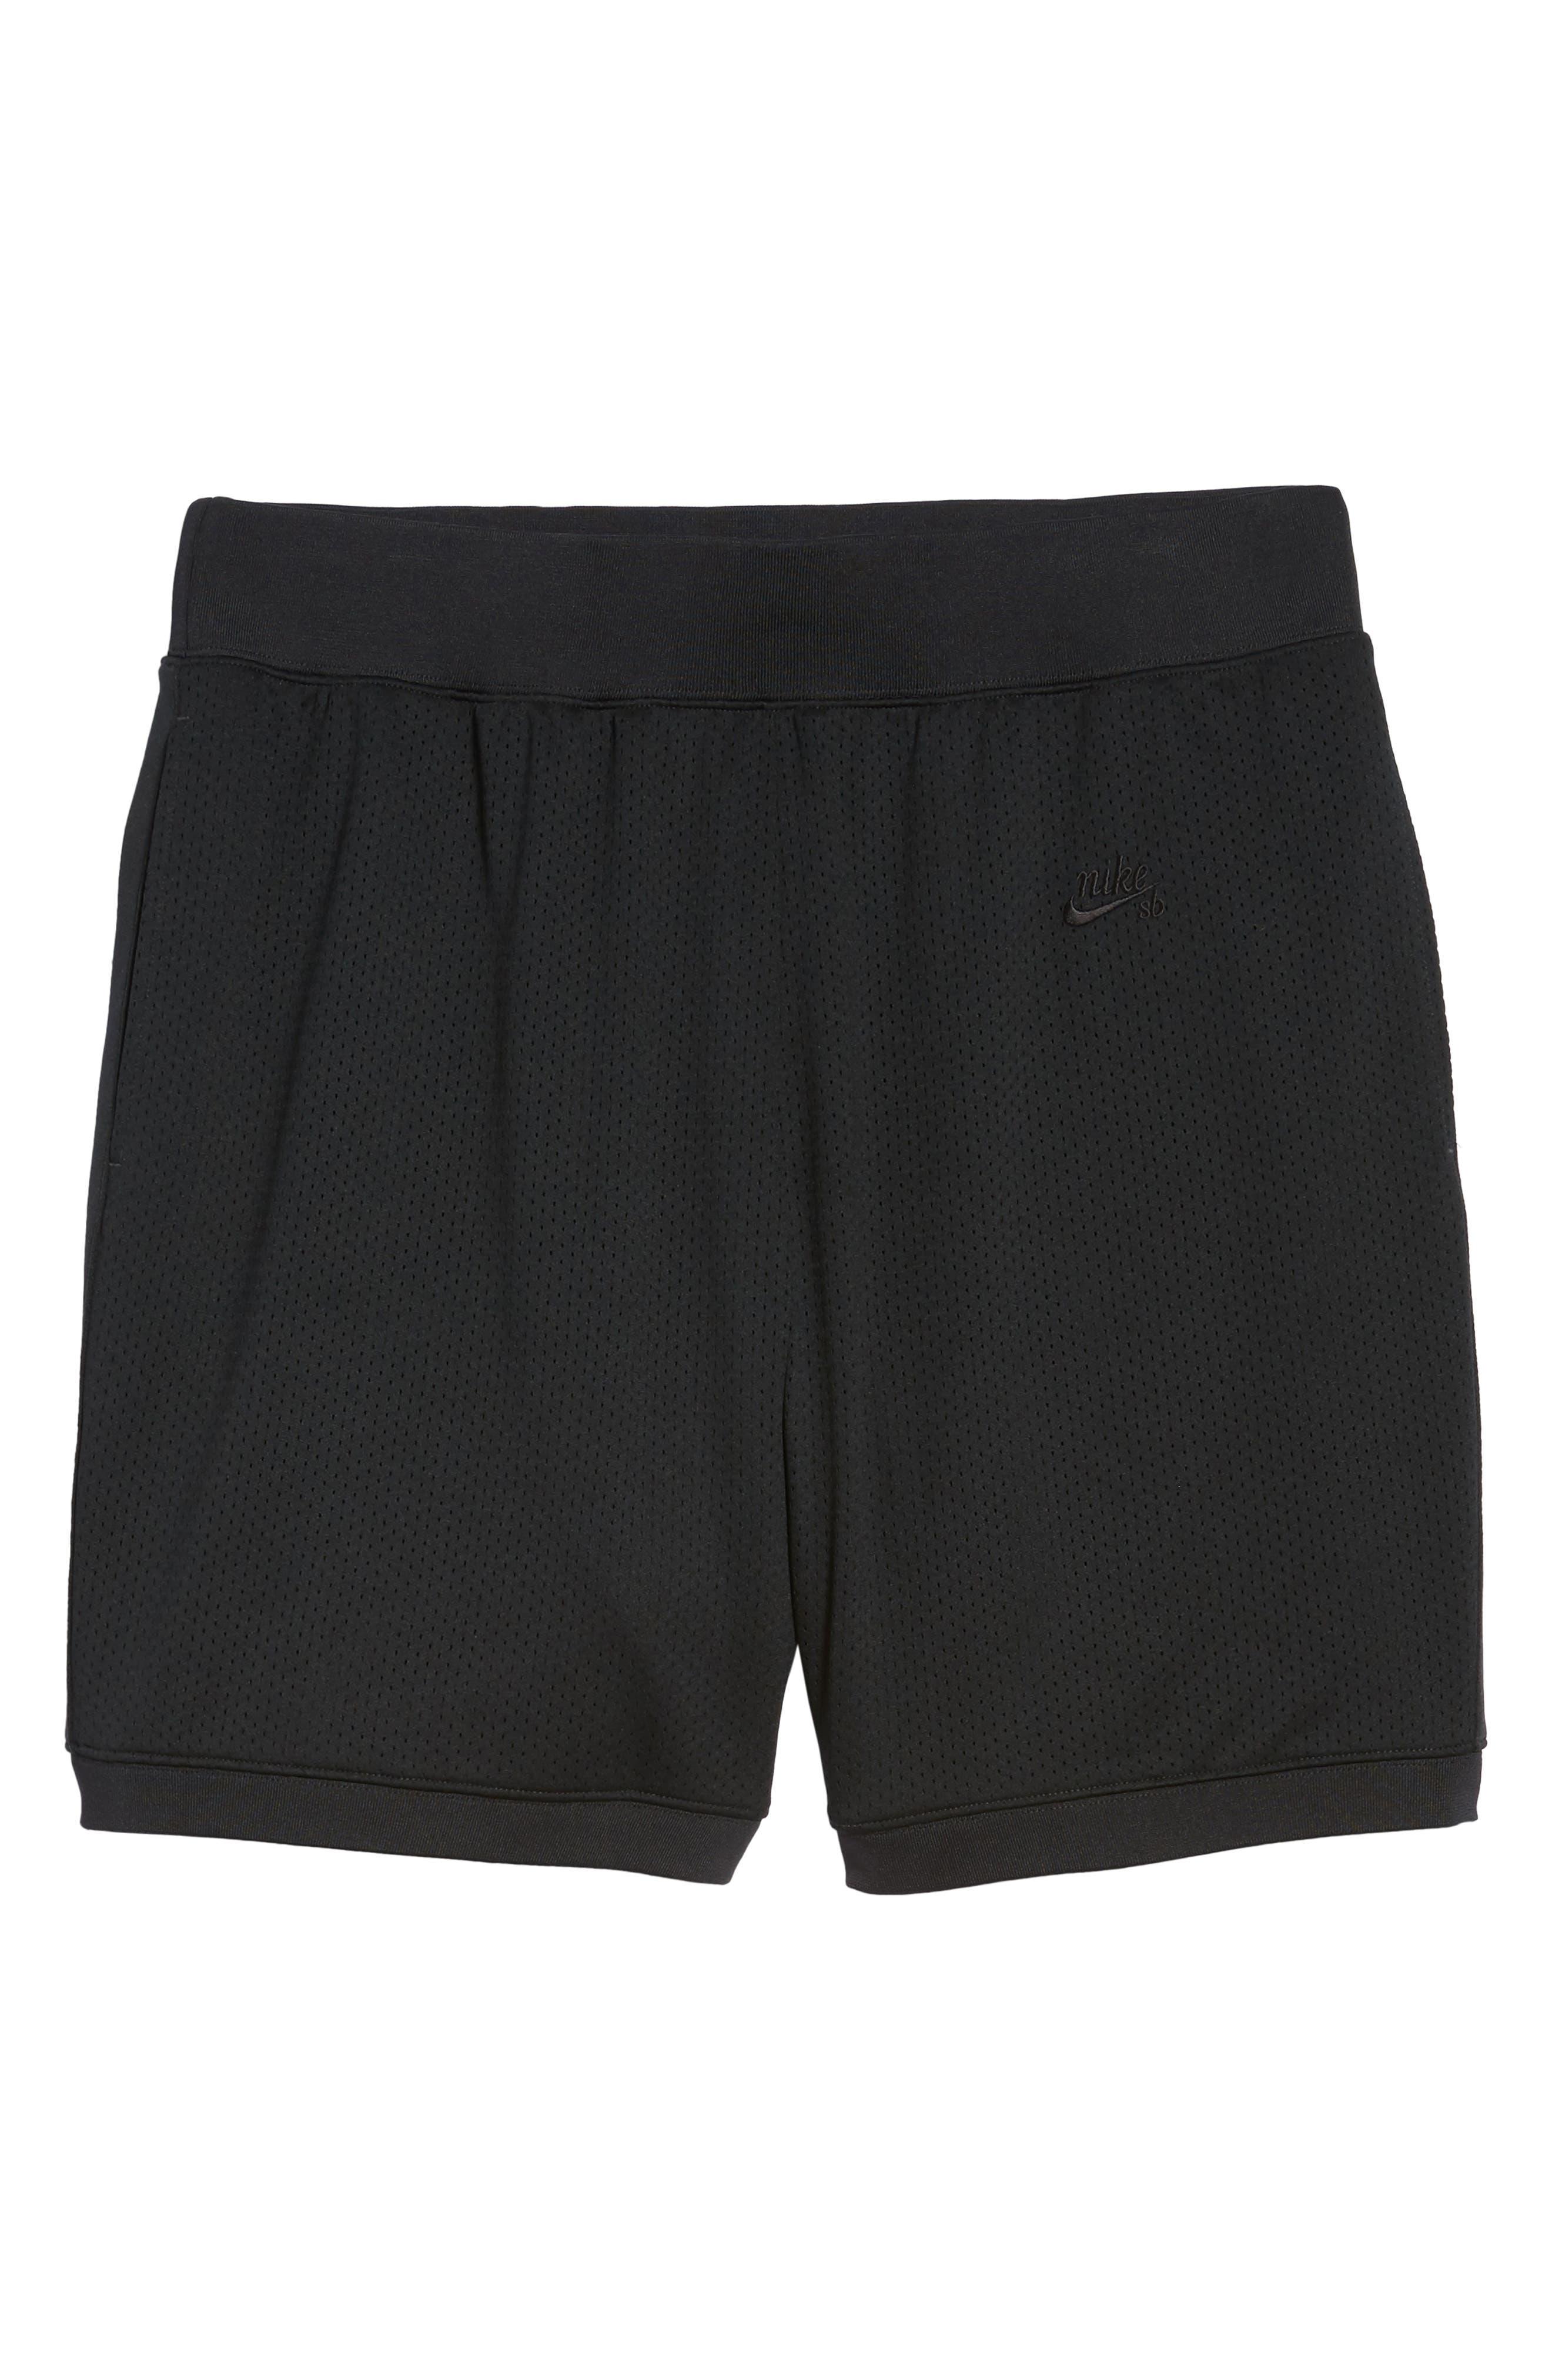 SB Dry Heritage Court Shorts,                             Alternate thumbnail 6, color,                             010